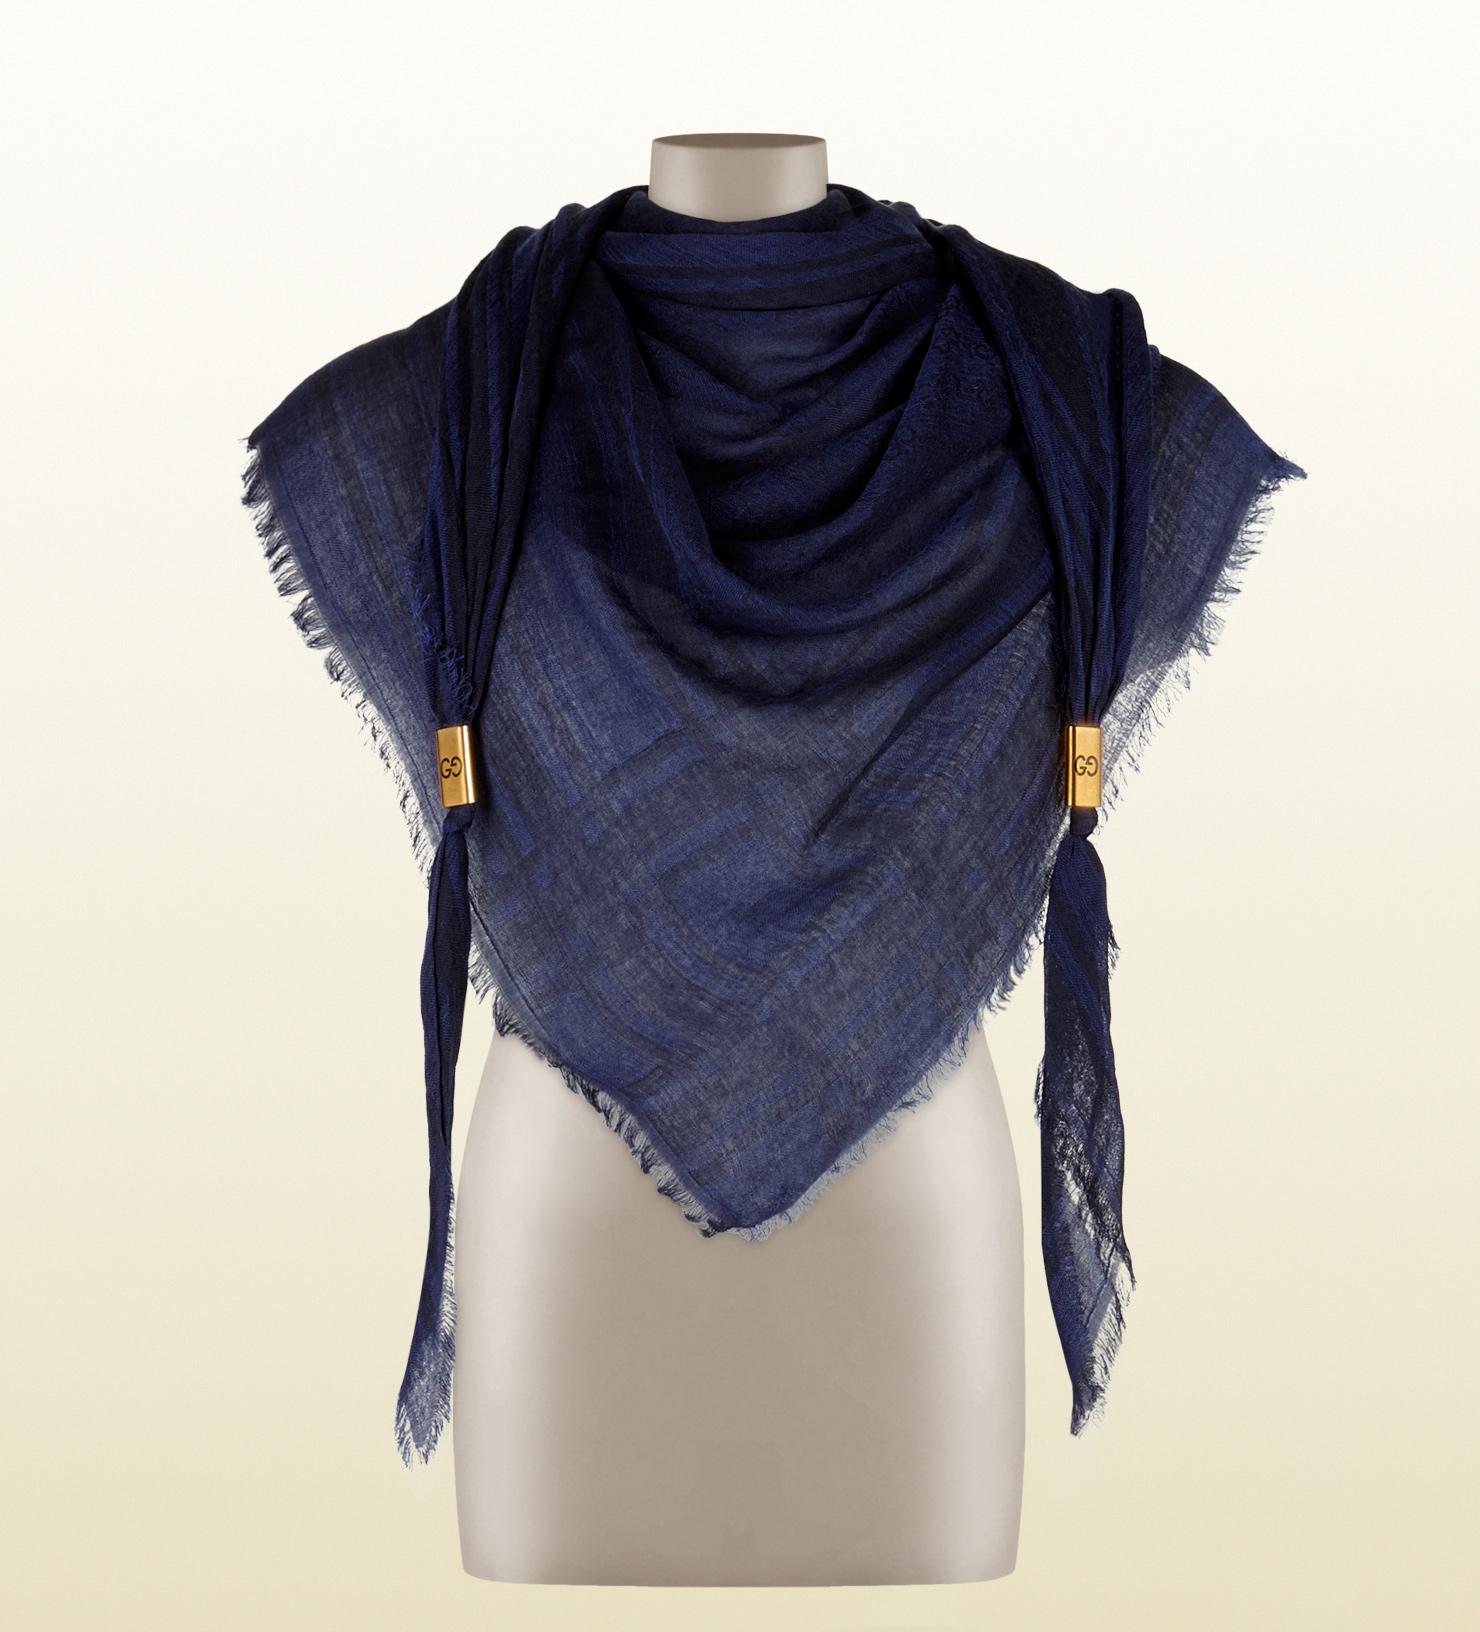 GG jacquard scarf - Blue Gucci 0pSD8VCXVN